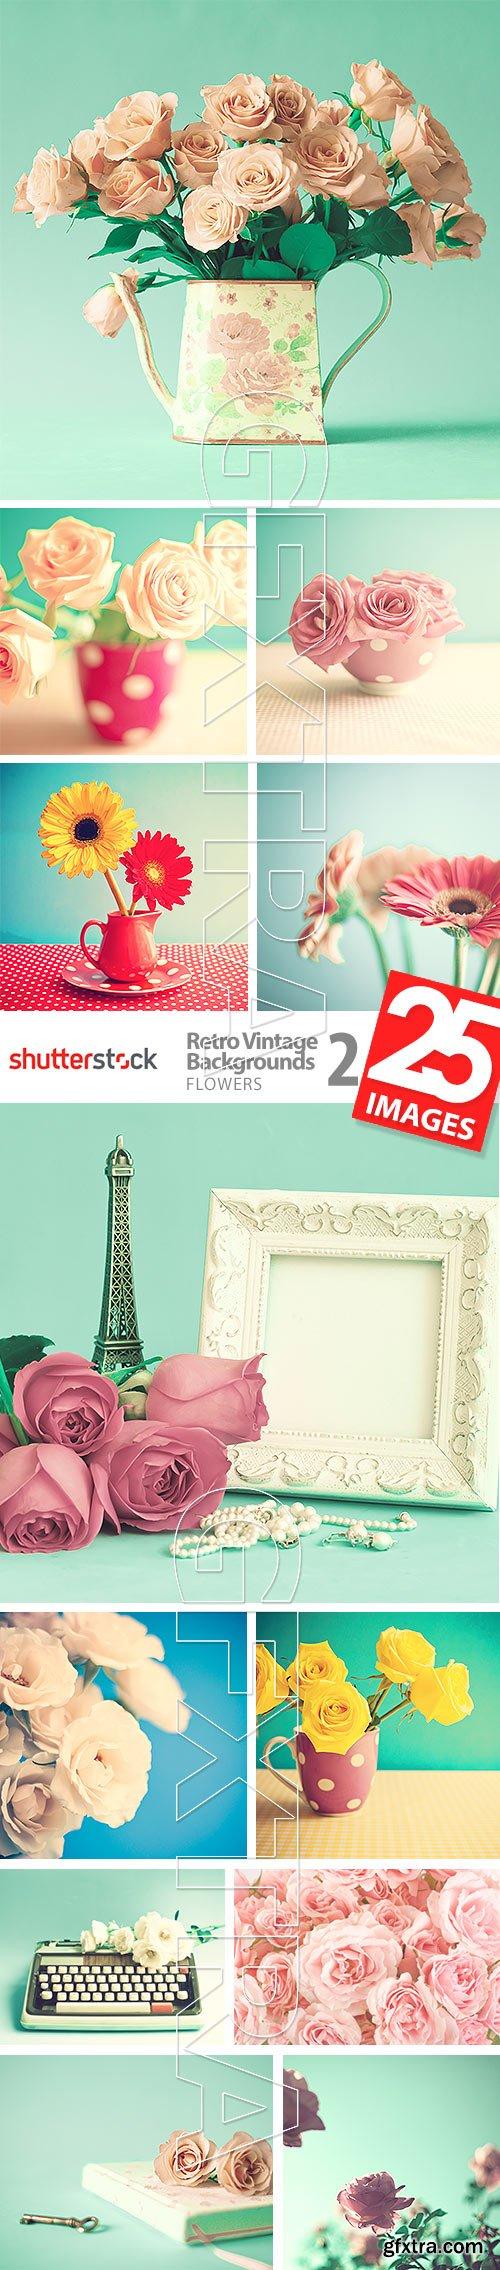 Retro Vintage Backgrounds 2 - Flowers 25xJPG